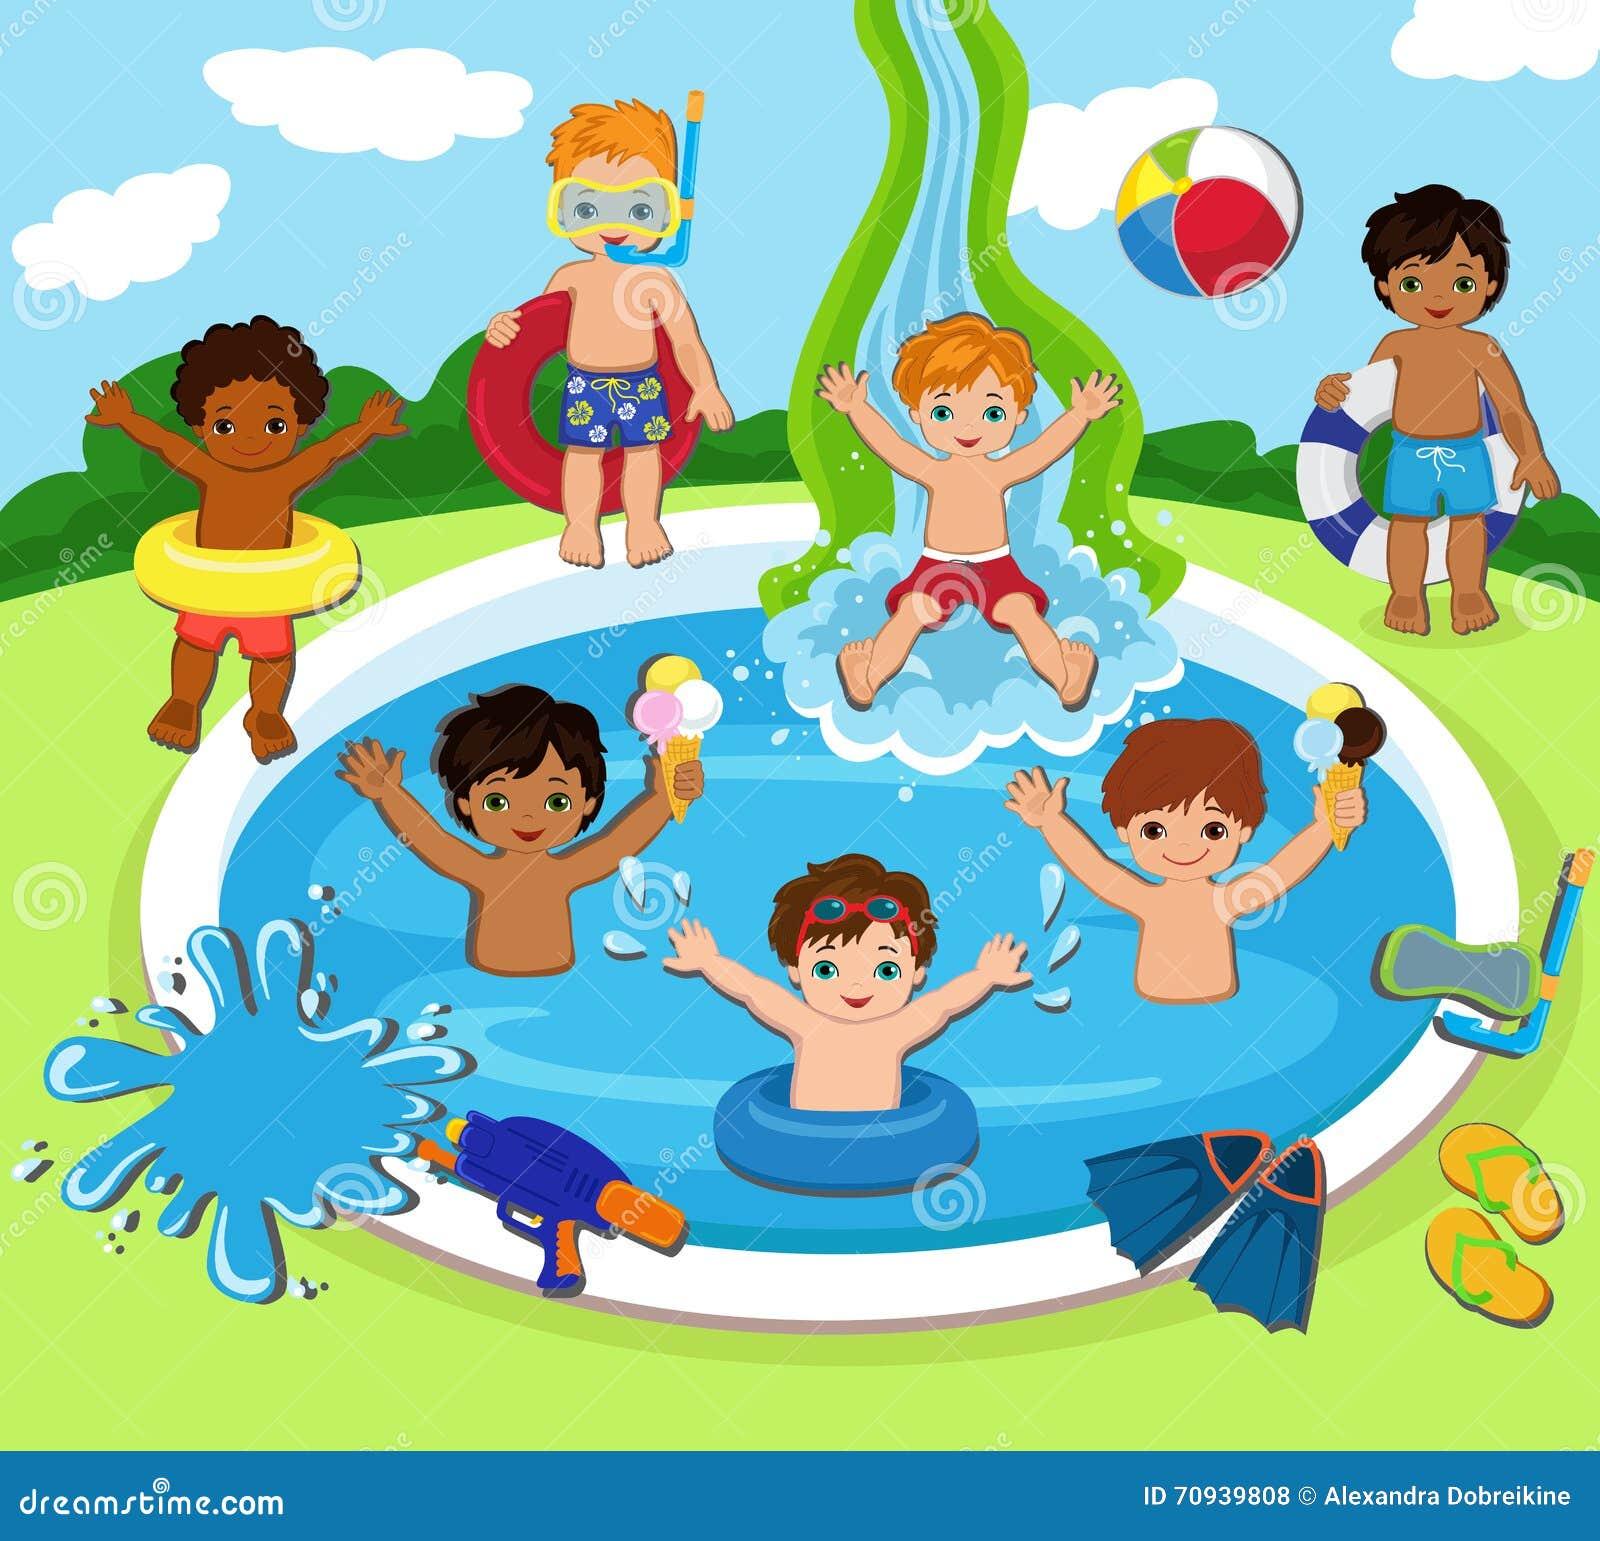 Cartoon Kids Playing Pool Volleyball